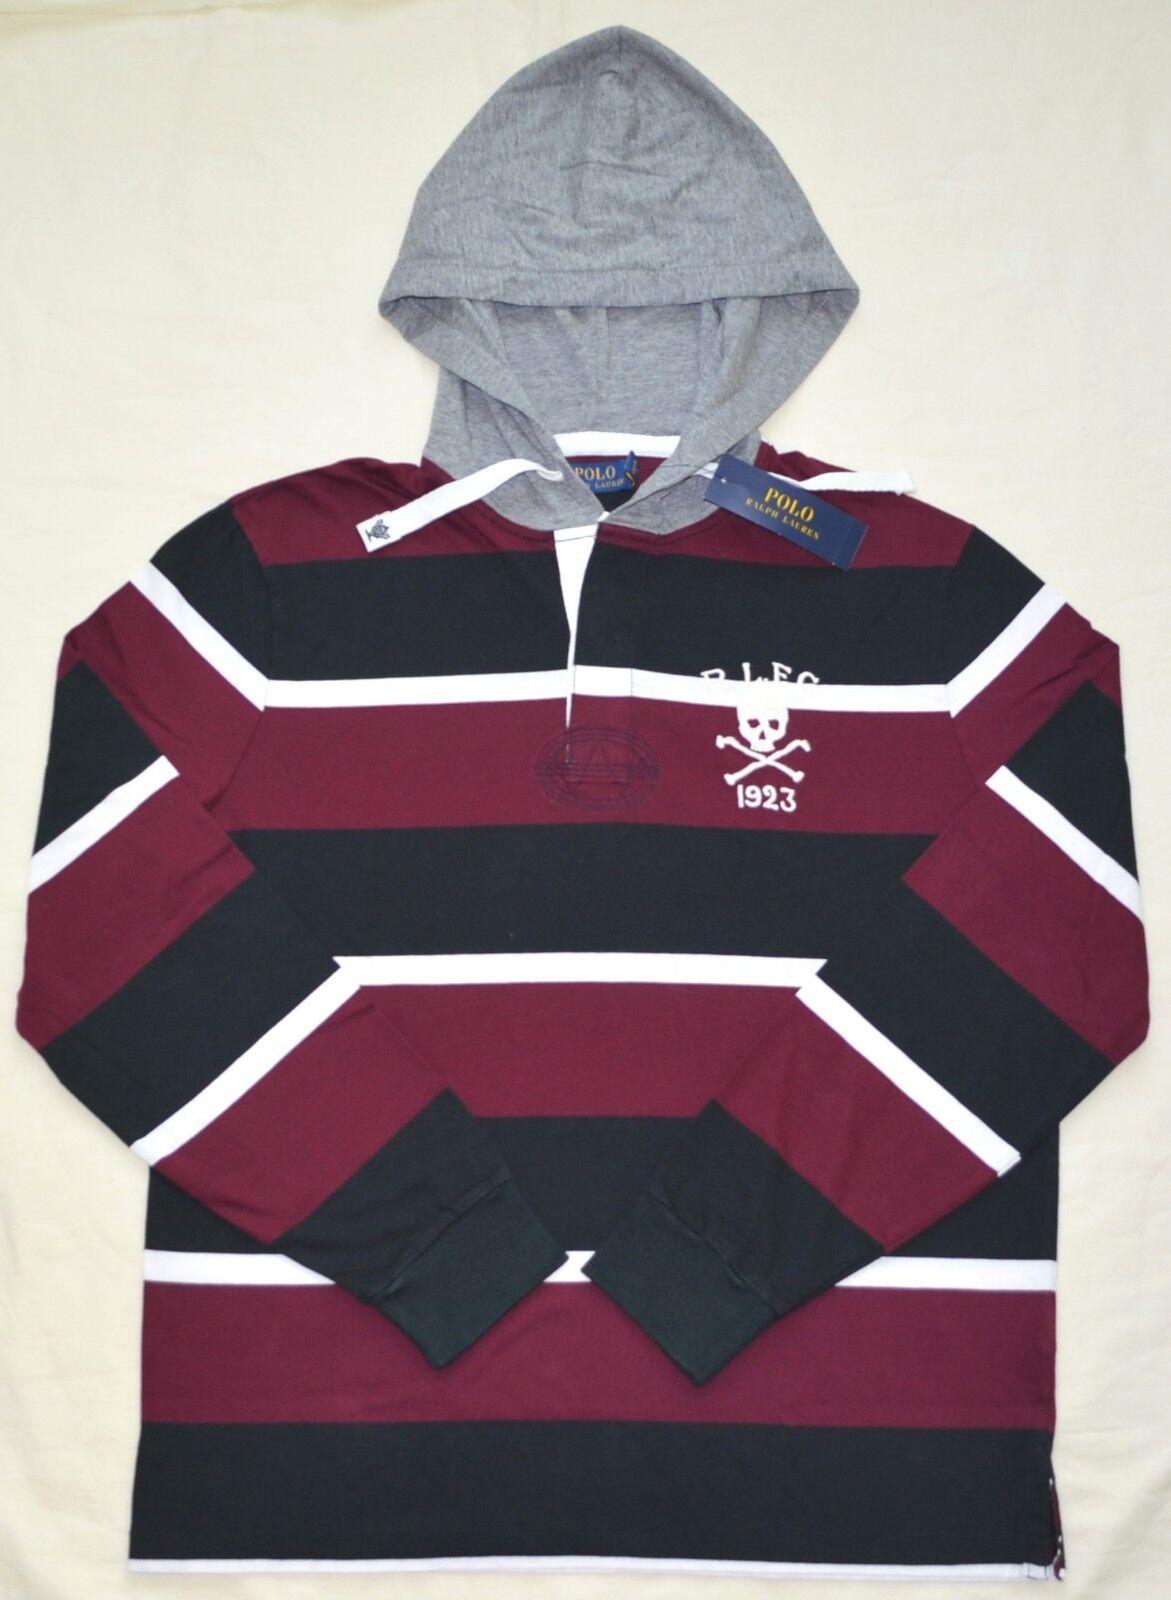 Neu XL XL Polo Ralph Lauren Herren mit Kapuze Rugby Hemd T-Shirt Kapuzenpulli